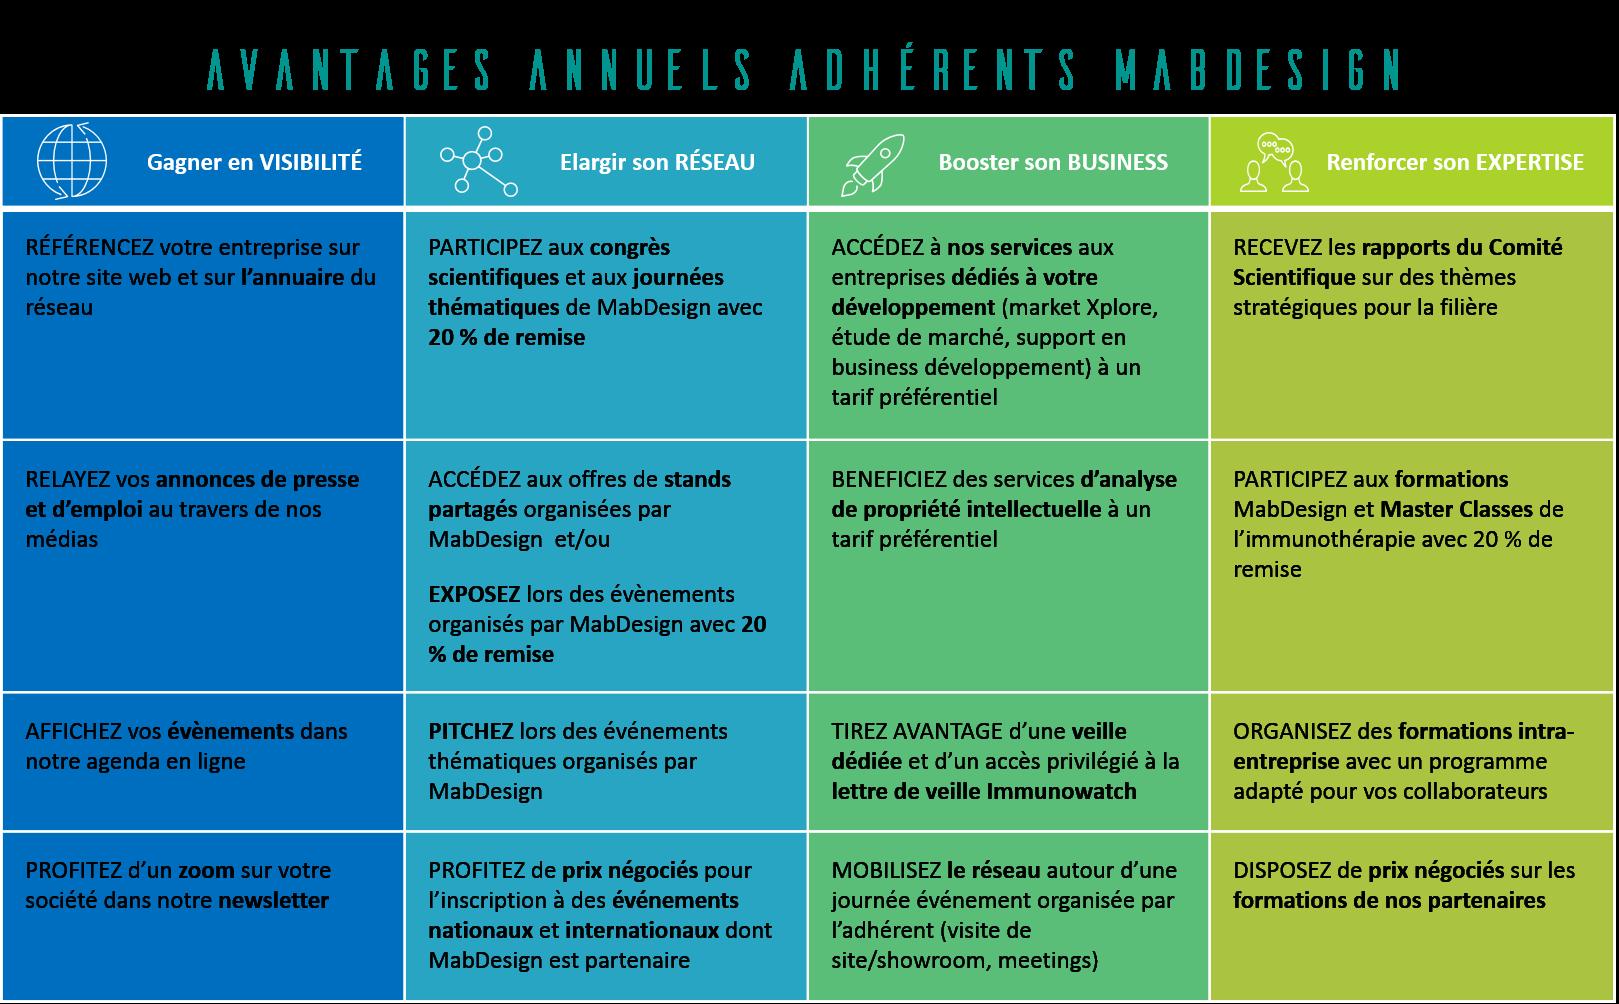 Avantages-adherents-2018